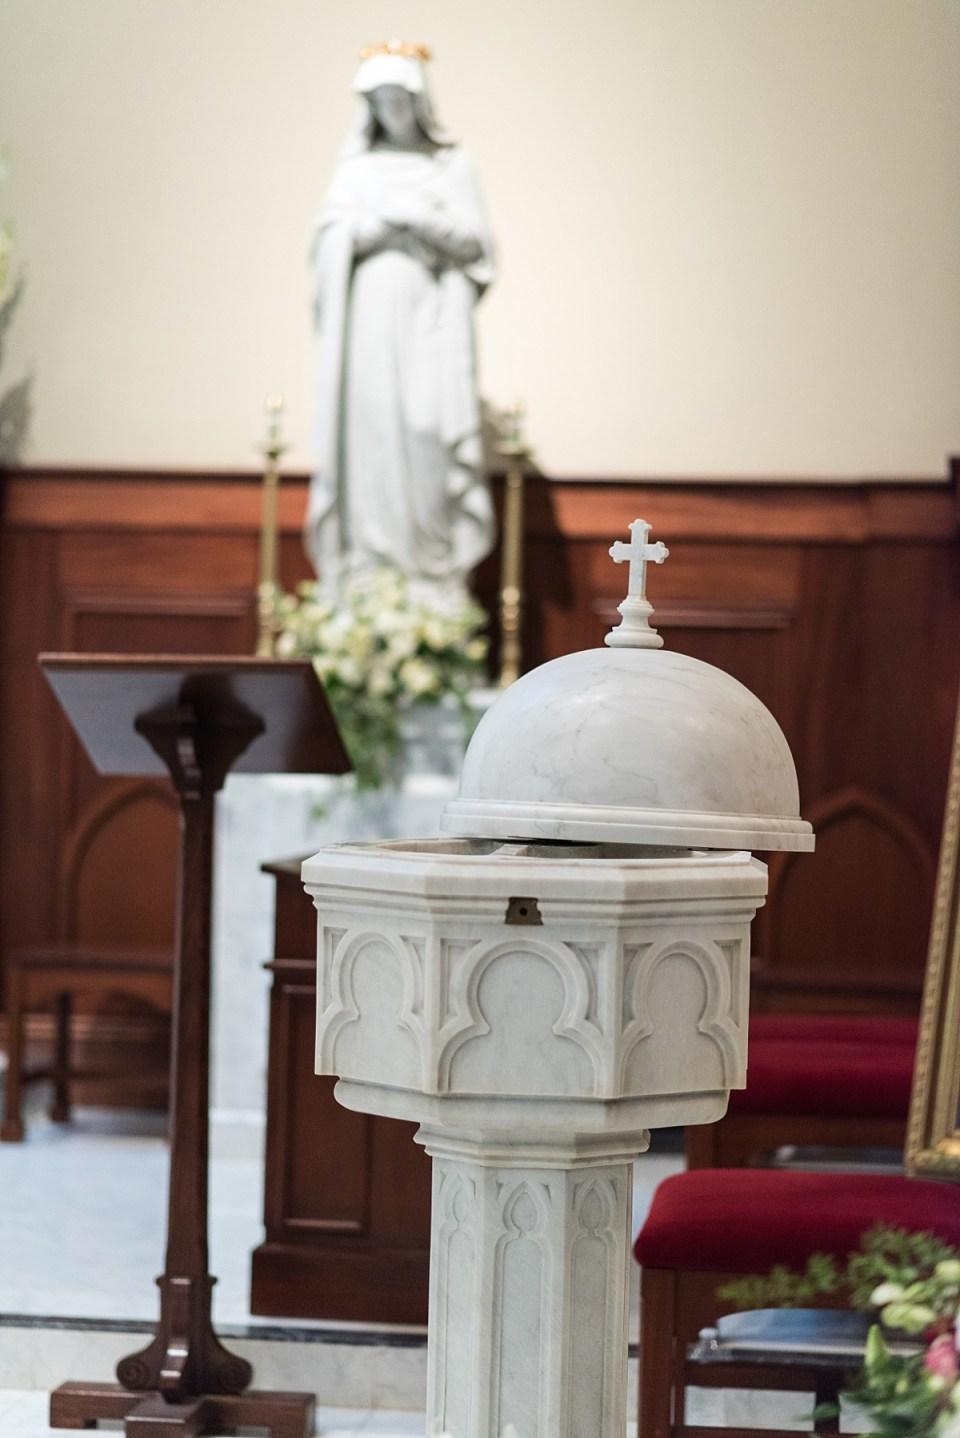 Baptism Font at St. Mary's Bascilica in Alexandria, VA